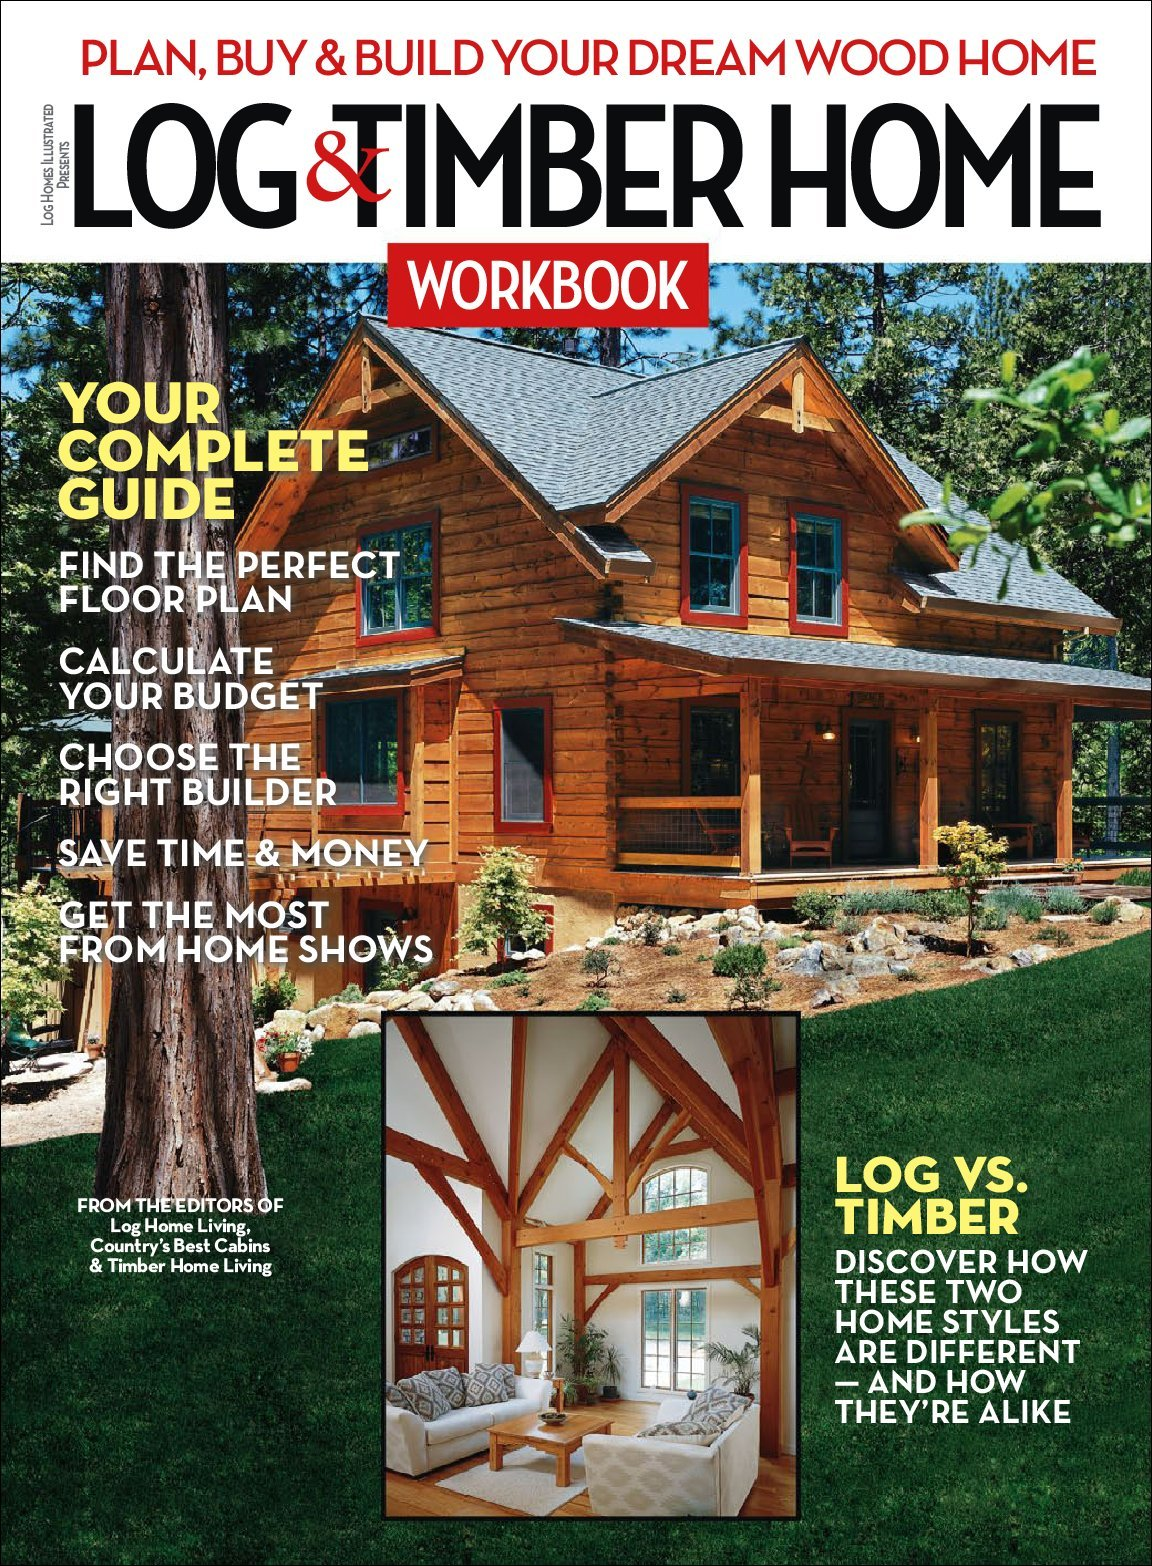 Log and Timber Workbook Digital